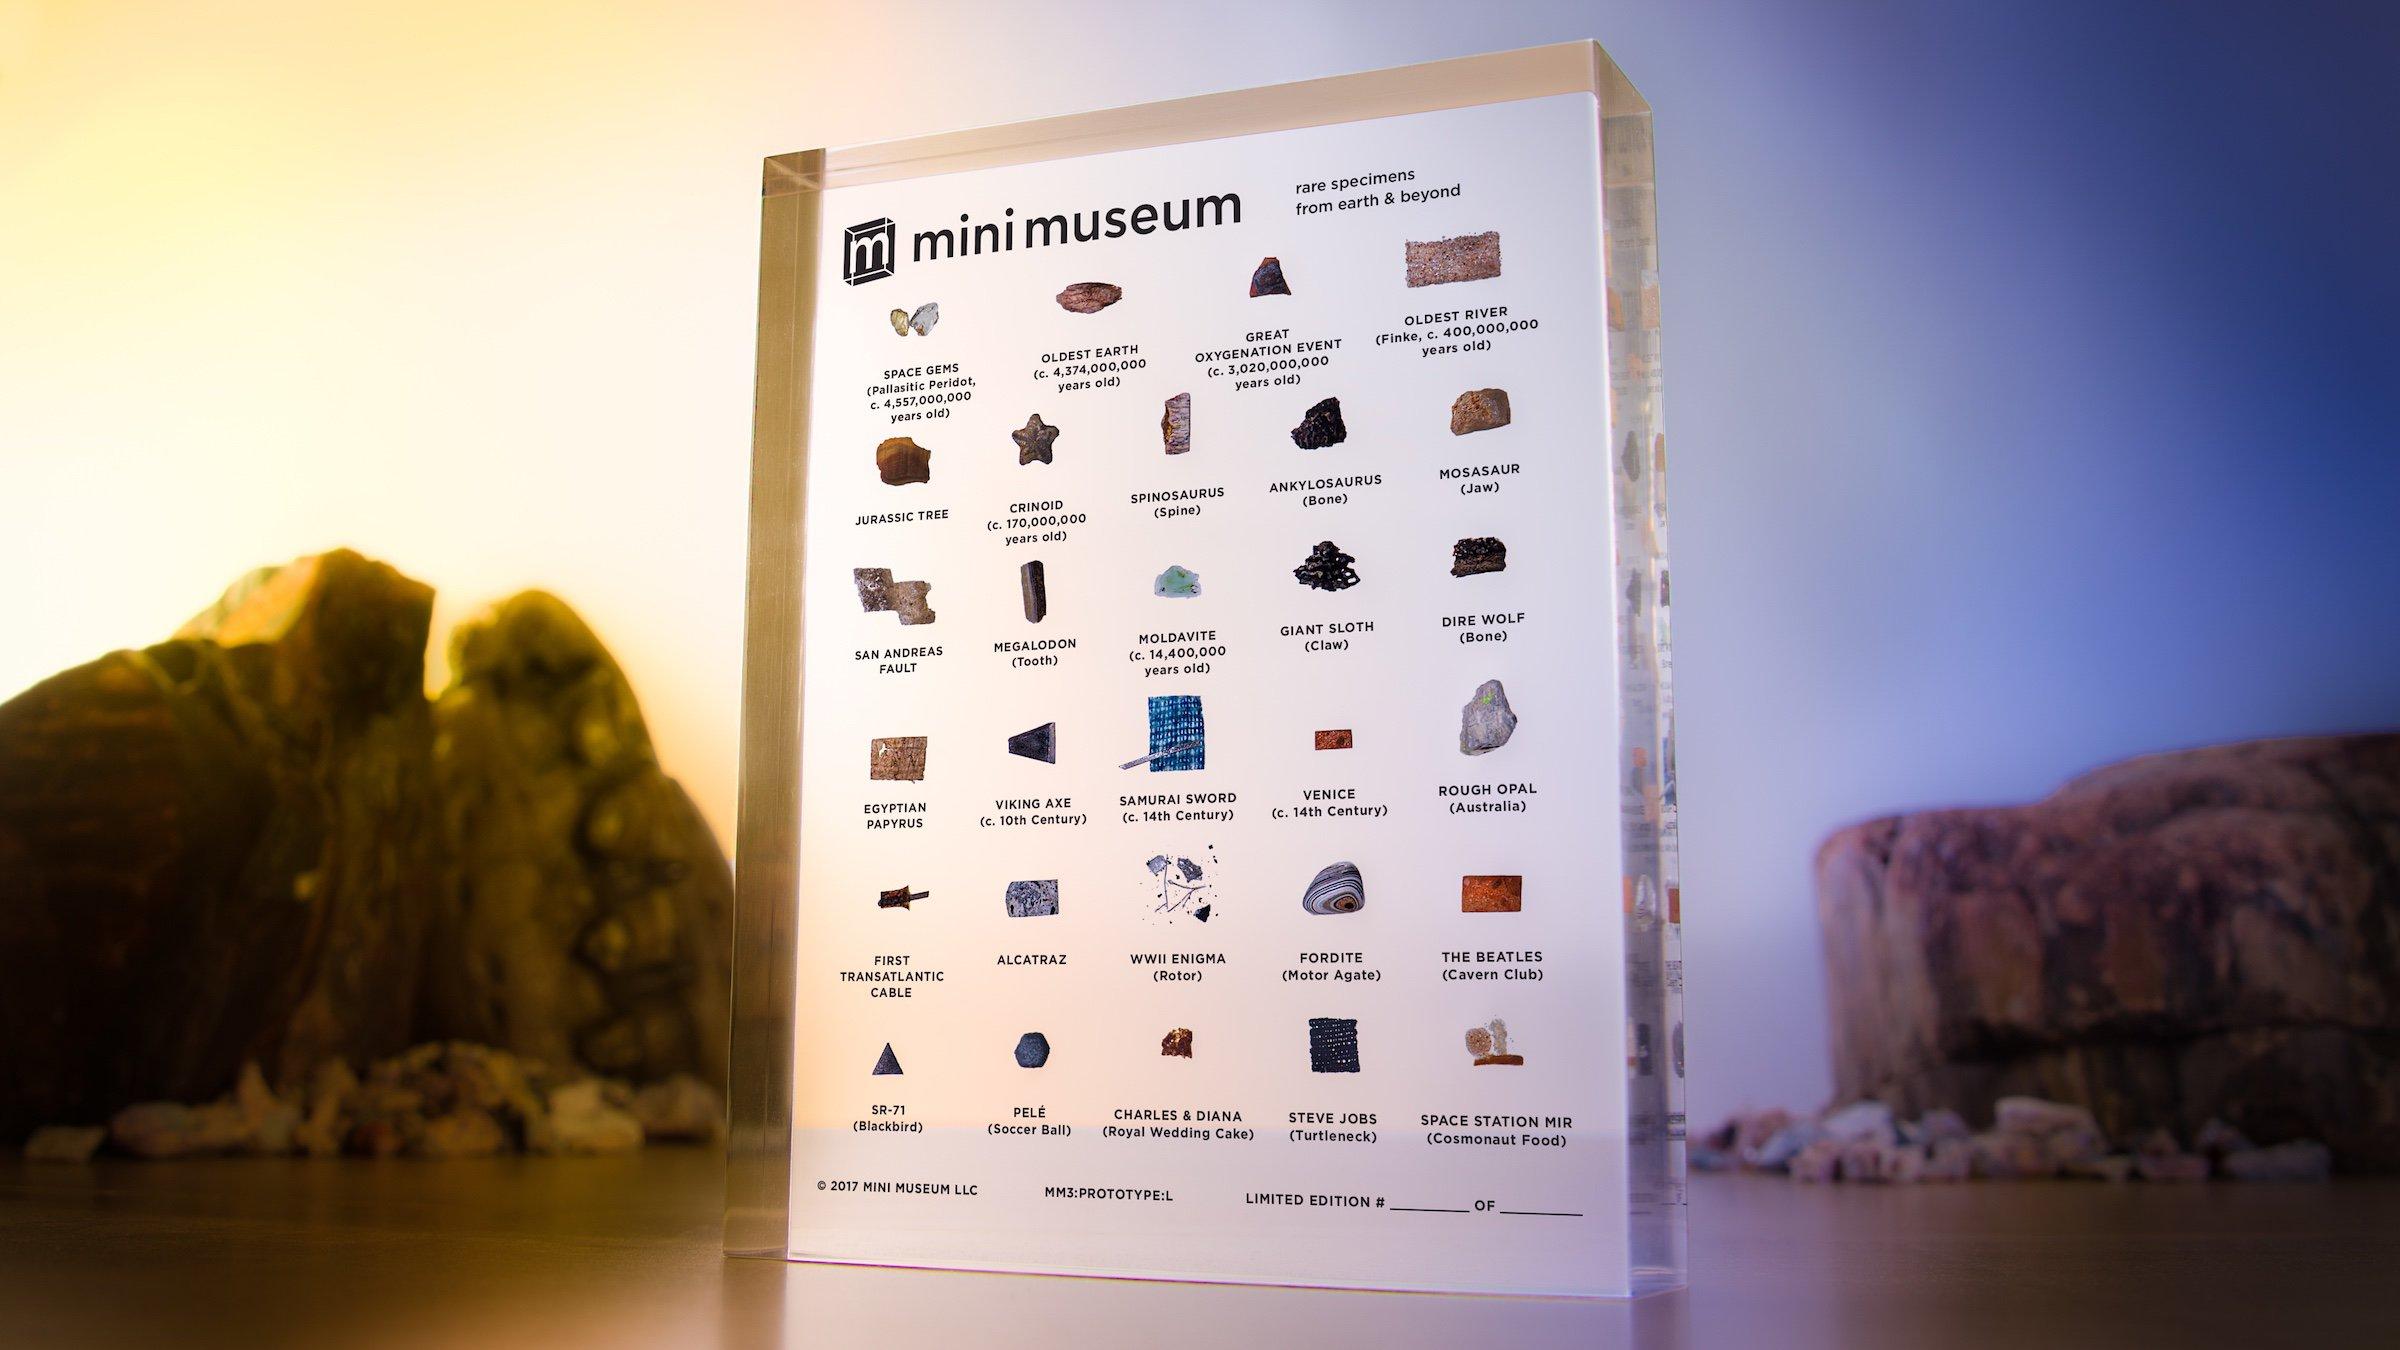 Mini Museum - Museum usa jobs